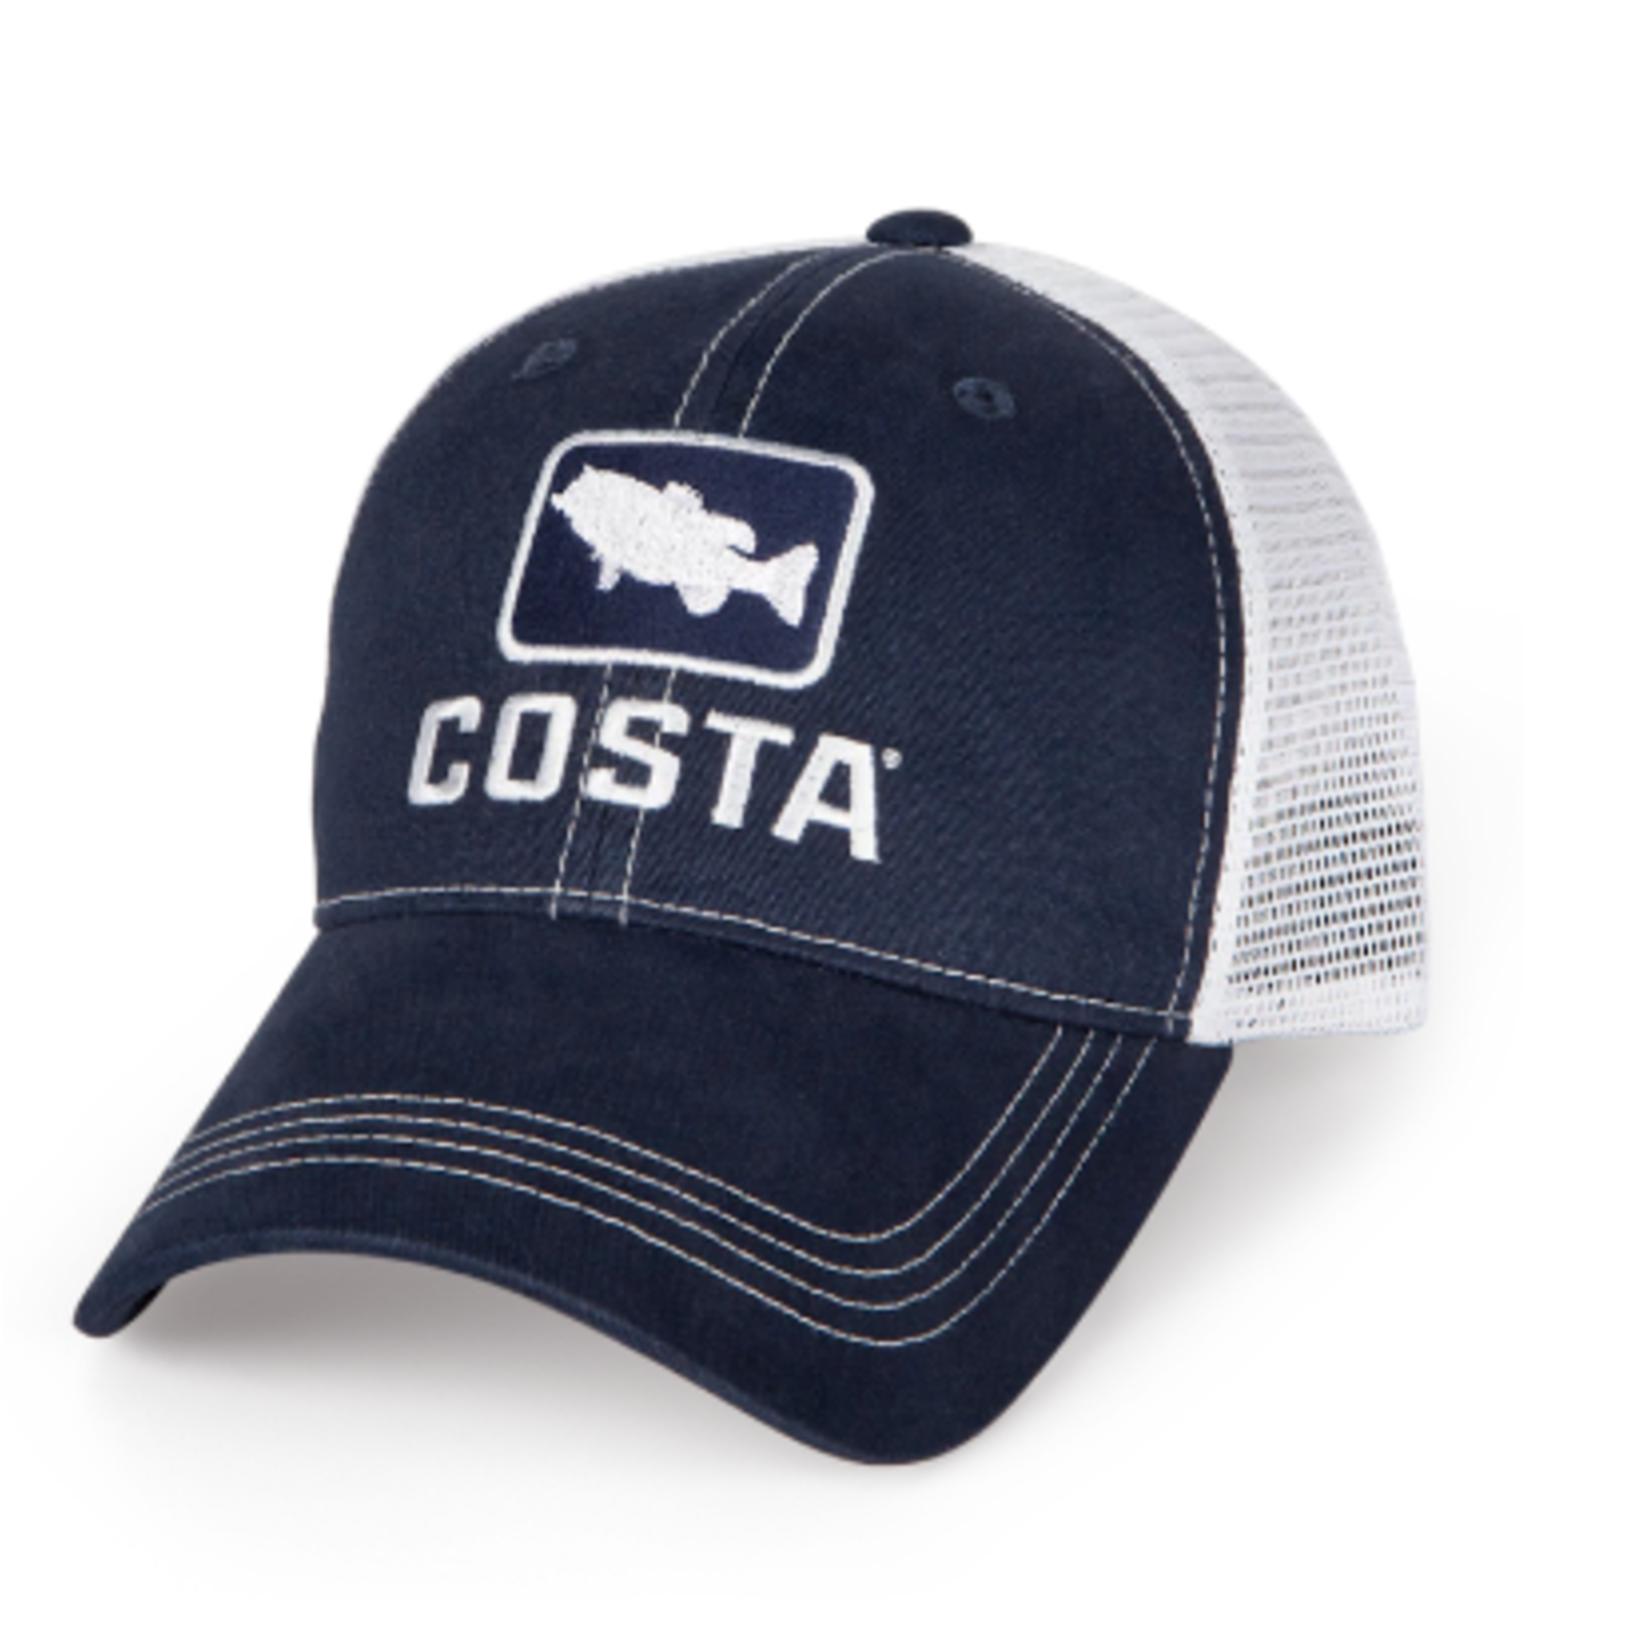 Costa Costa Bass Trucker Navy